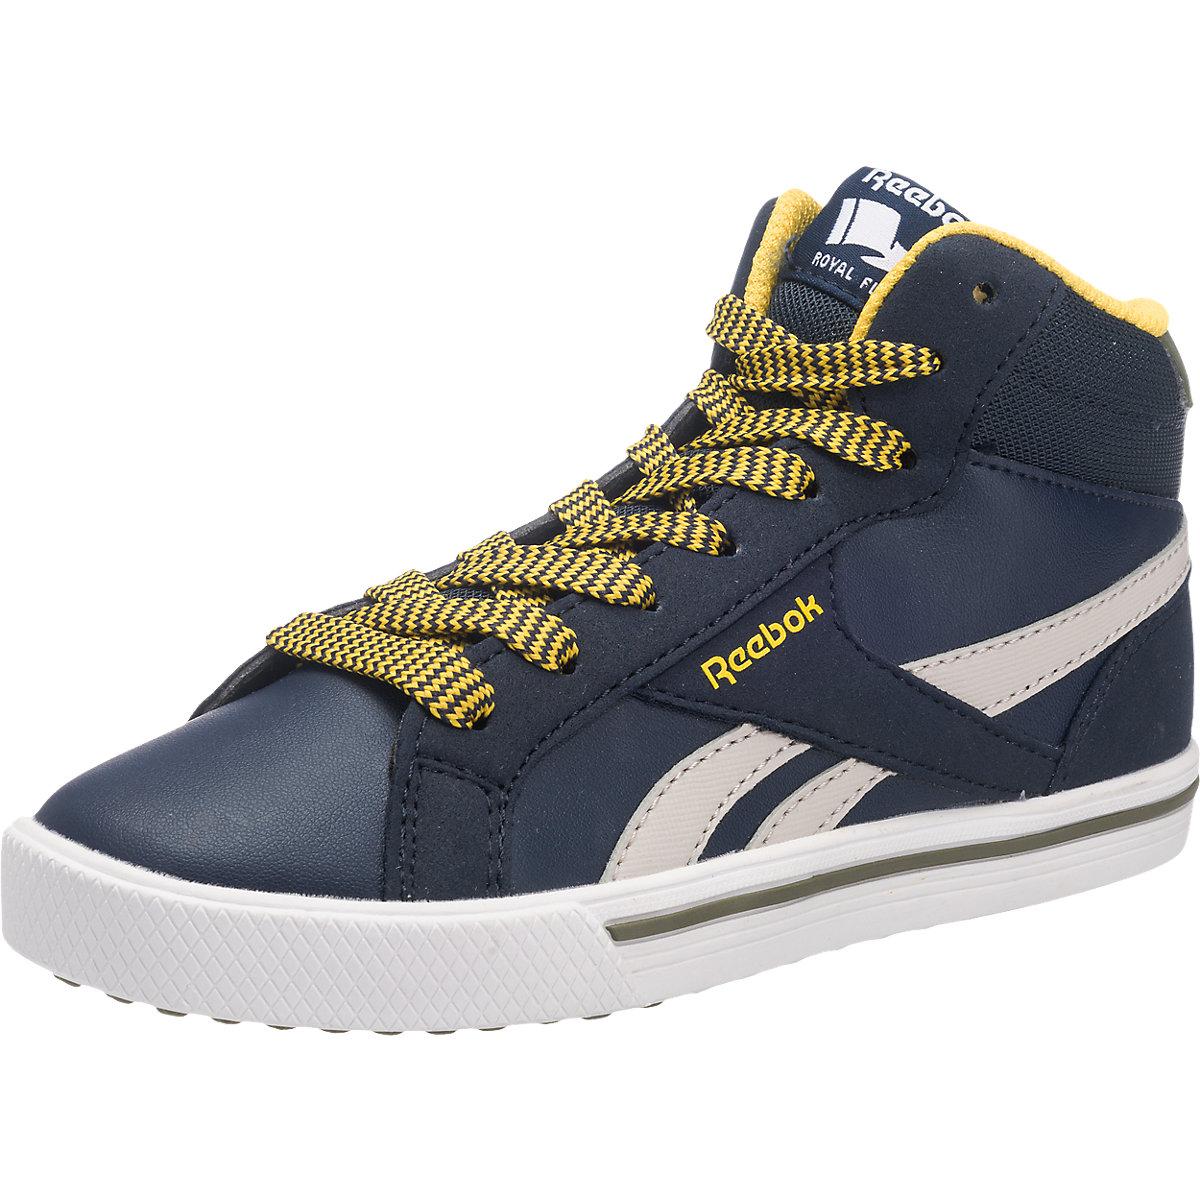 Reebok, Kinder Sneakers High Royal Comp 2 für Jungen, blau ...